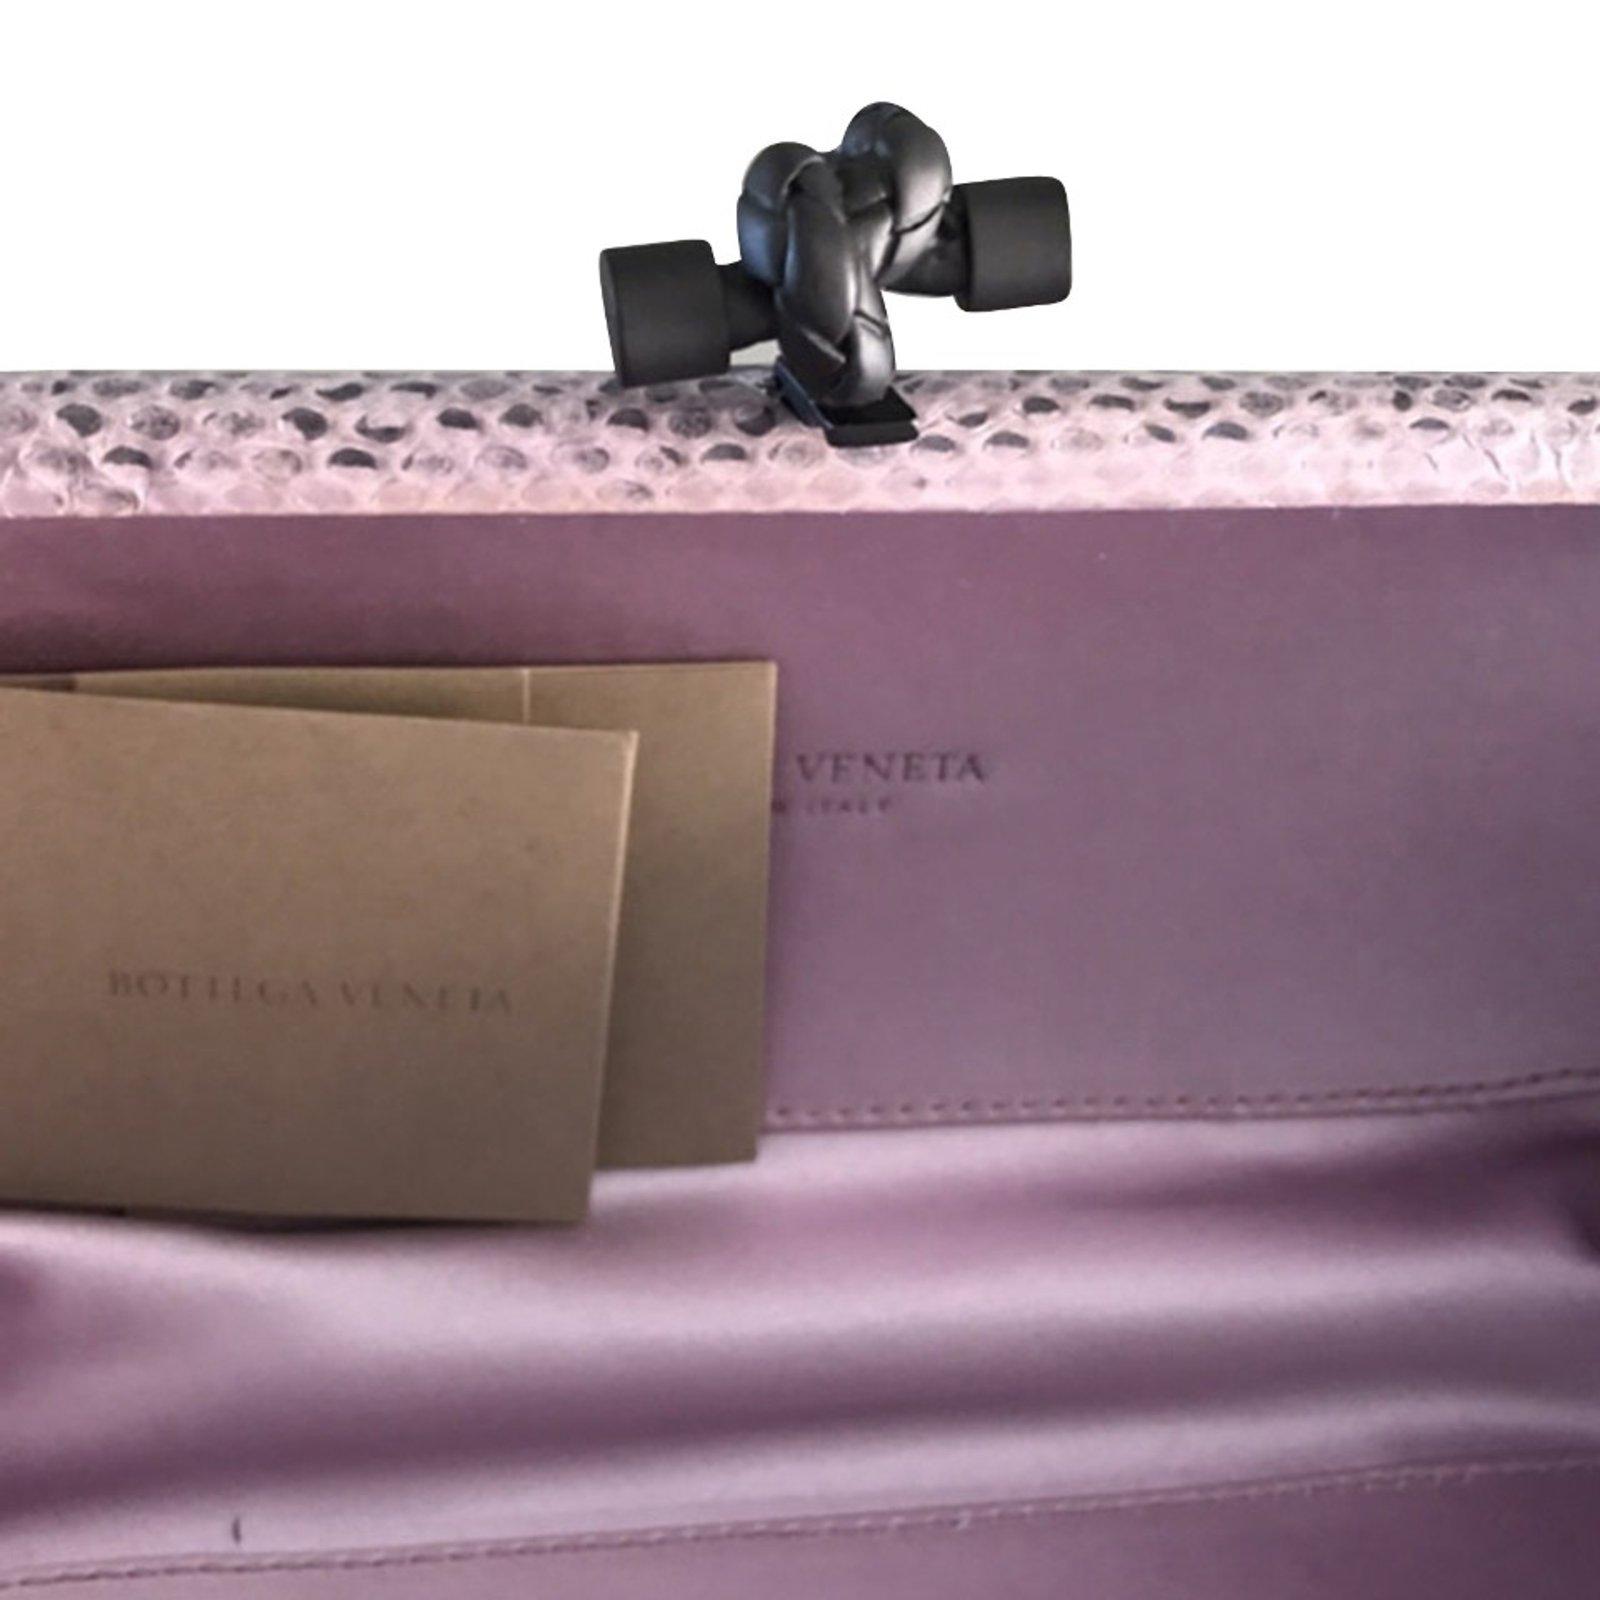 17ea6d6f7b Bottega Veneta KNOT Clutch bags Exotic leather